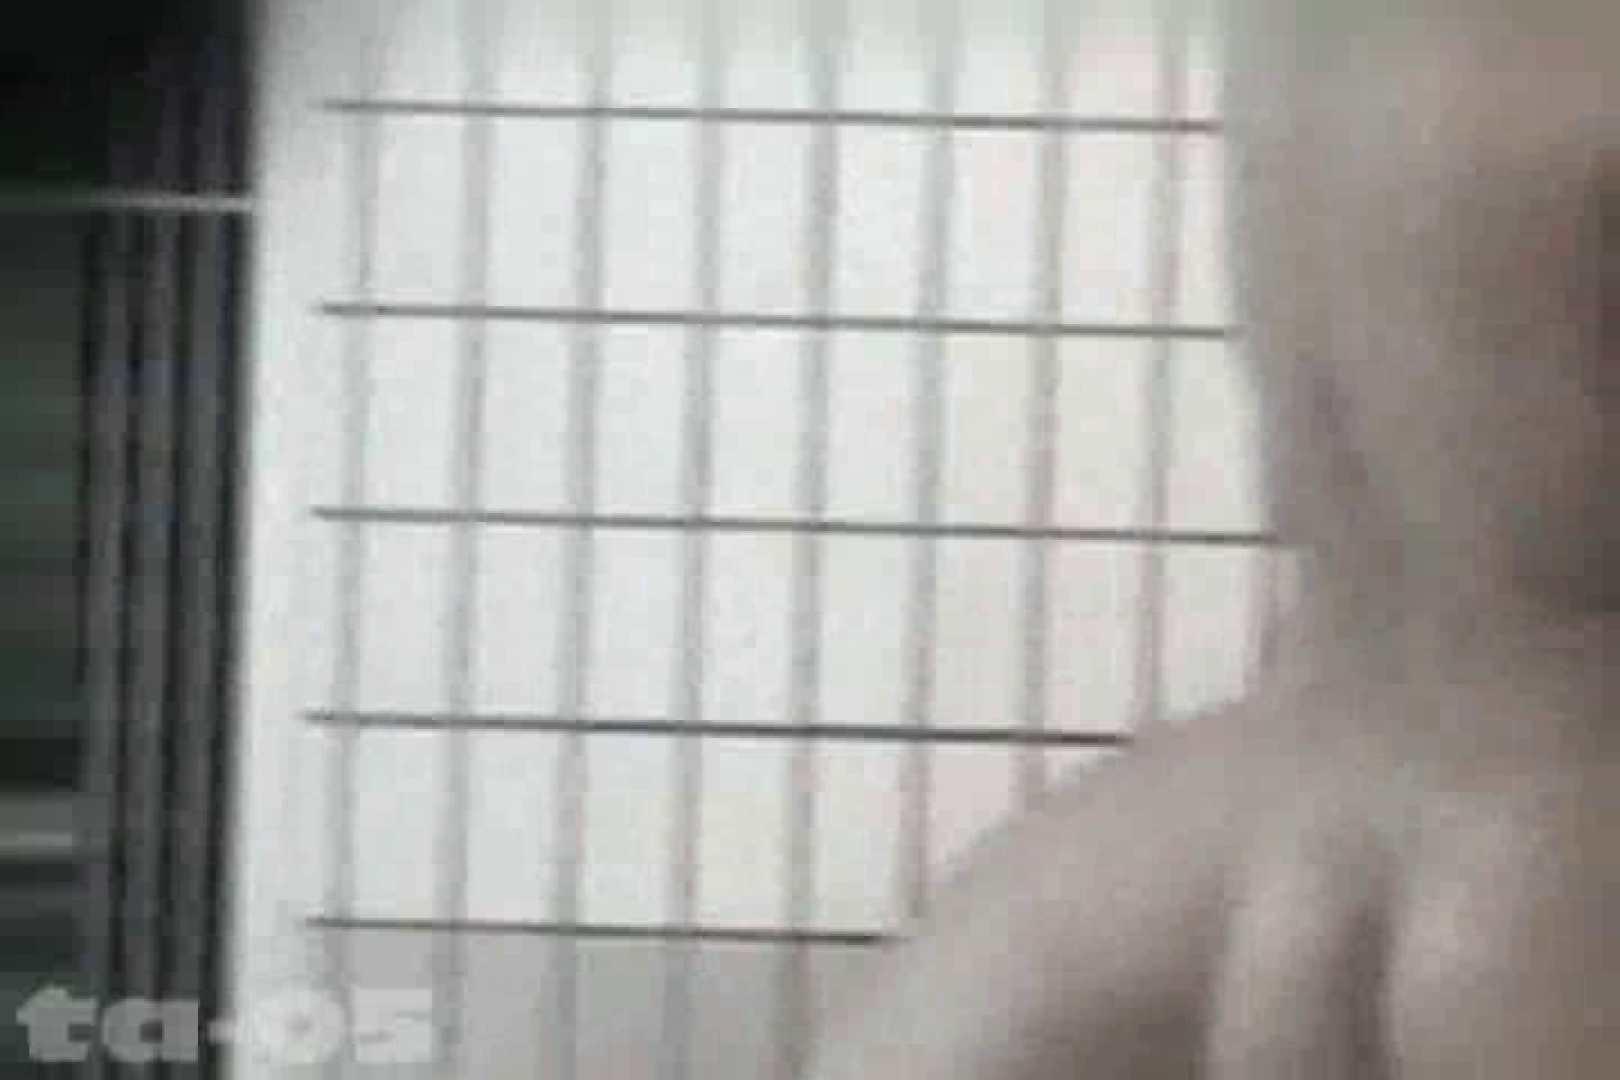 合宿ホテル女風呂盗撮高画質版 Vol.05 合宿 | 女風呂  29pic 1